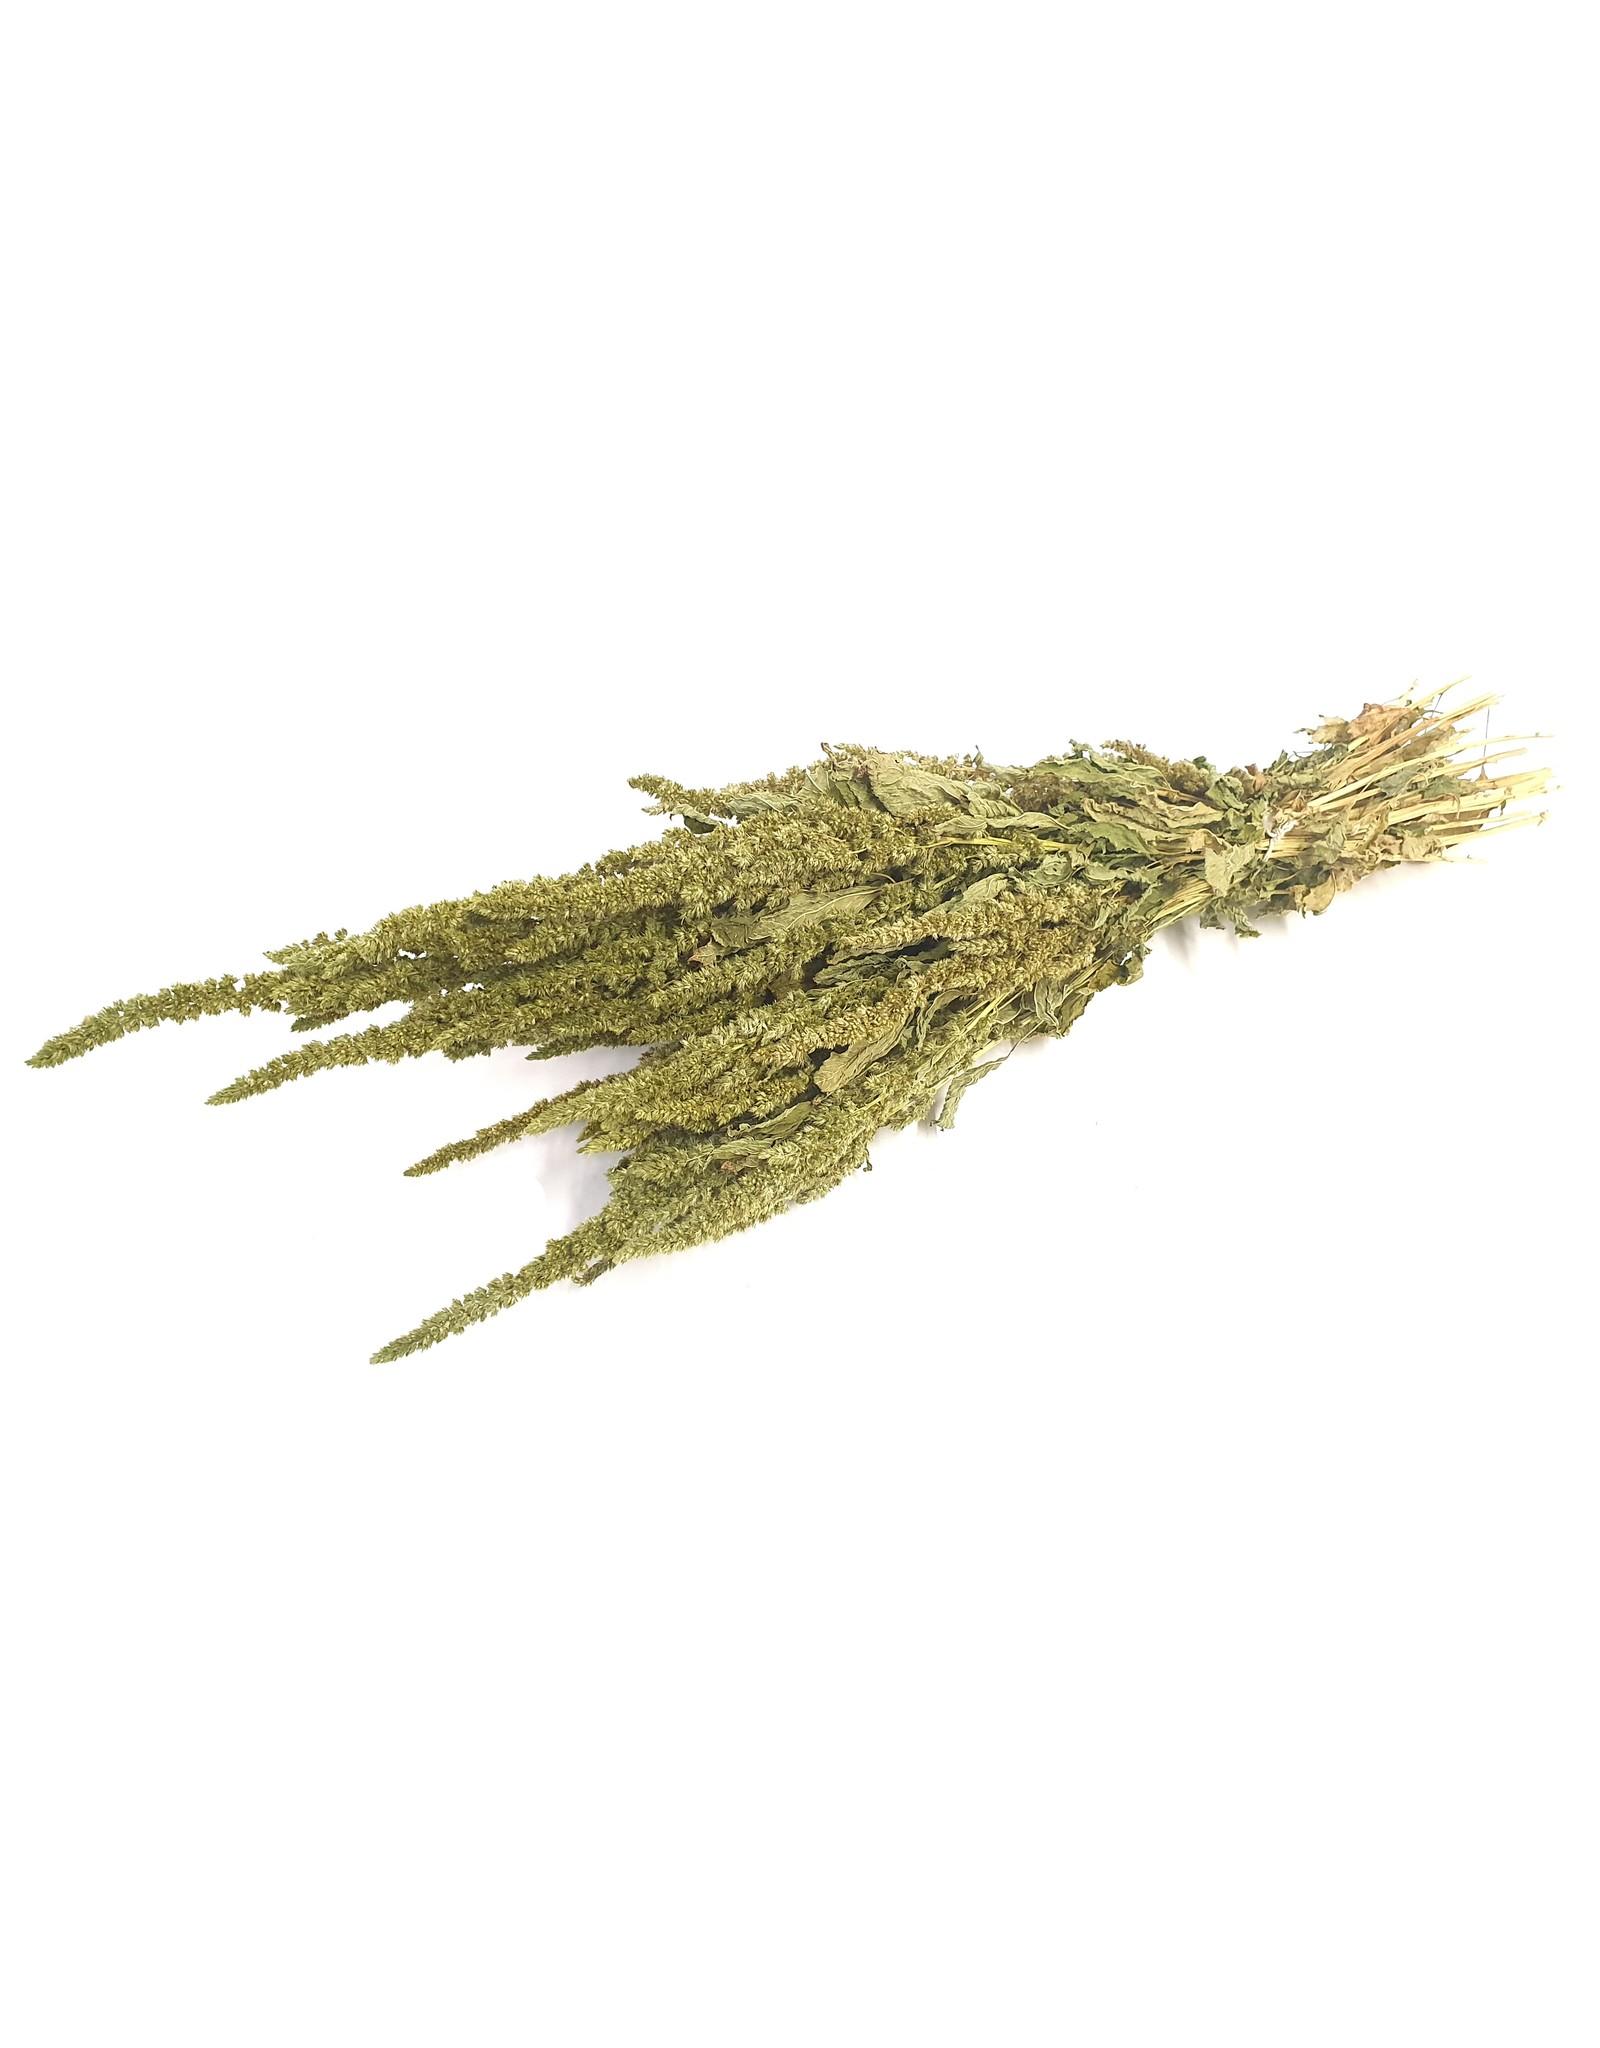 Amaranthus per bunch Green x 6